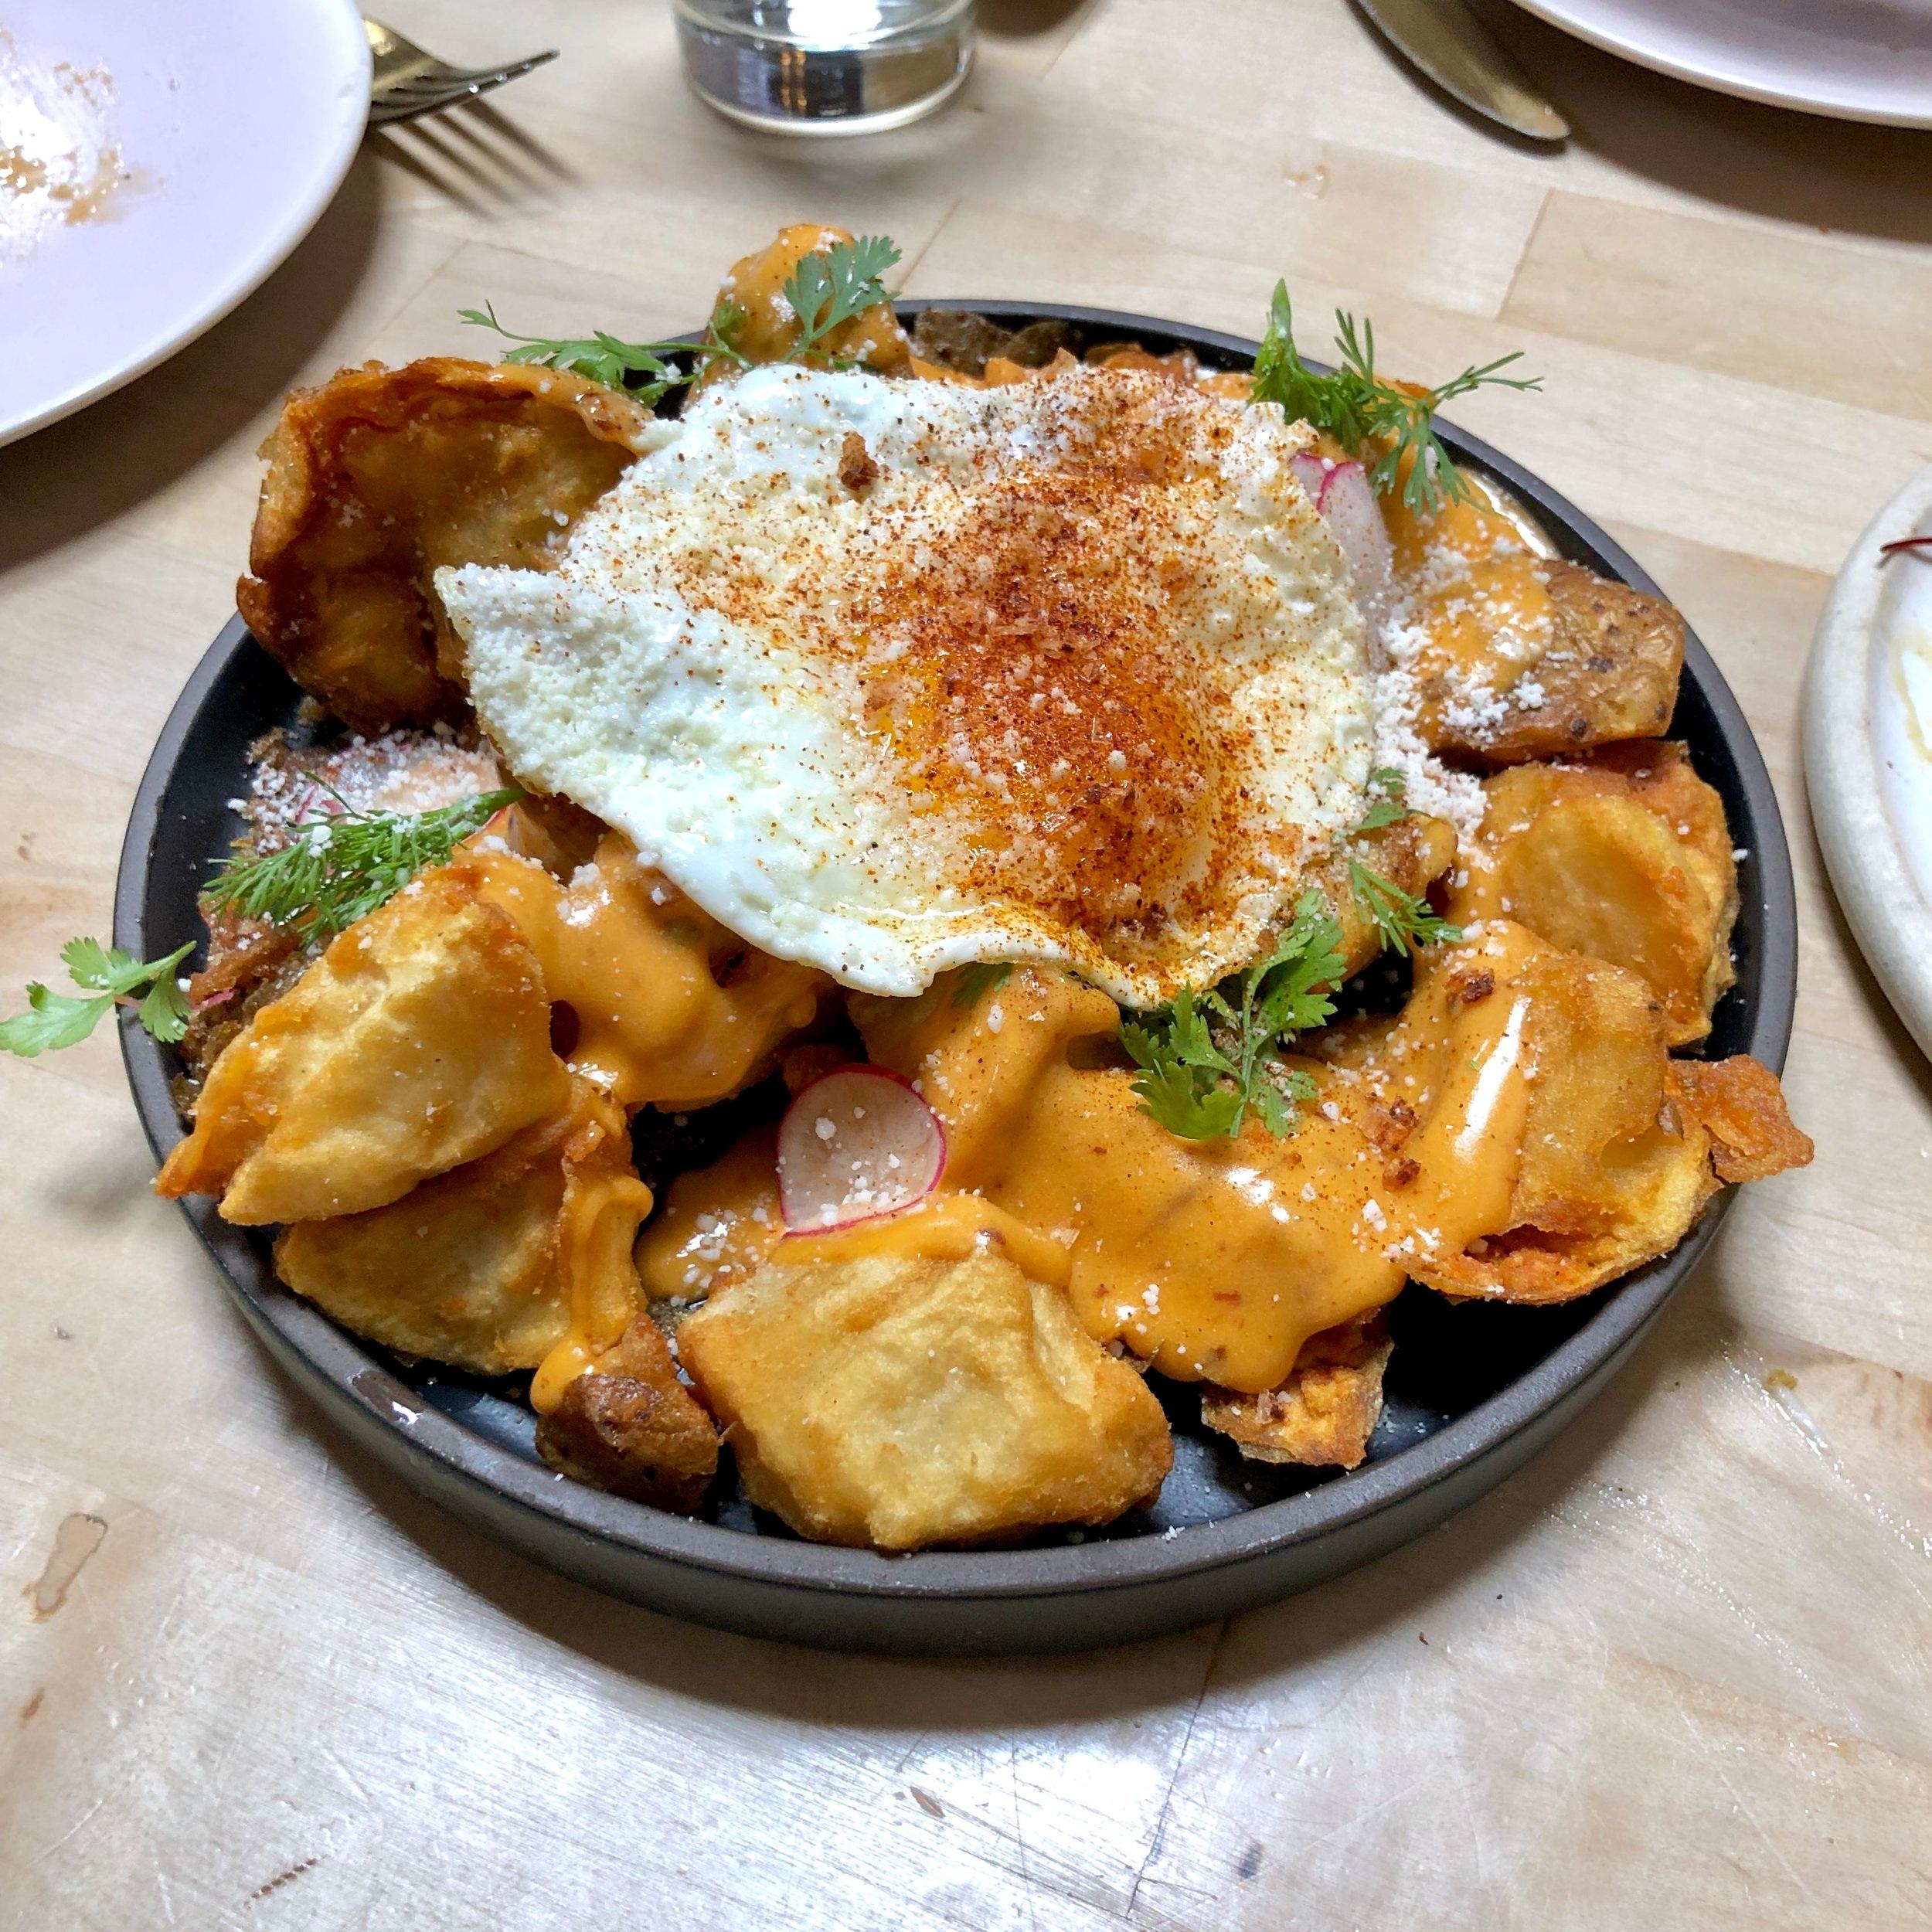 loaded crispy smashed potatoes // sunny egg, chipotle queso, salsa taquero